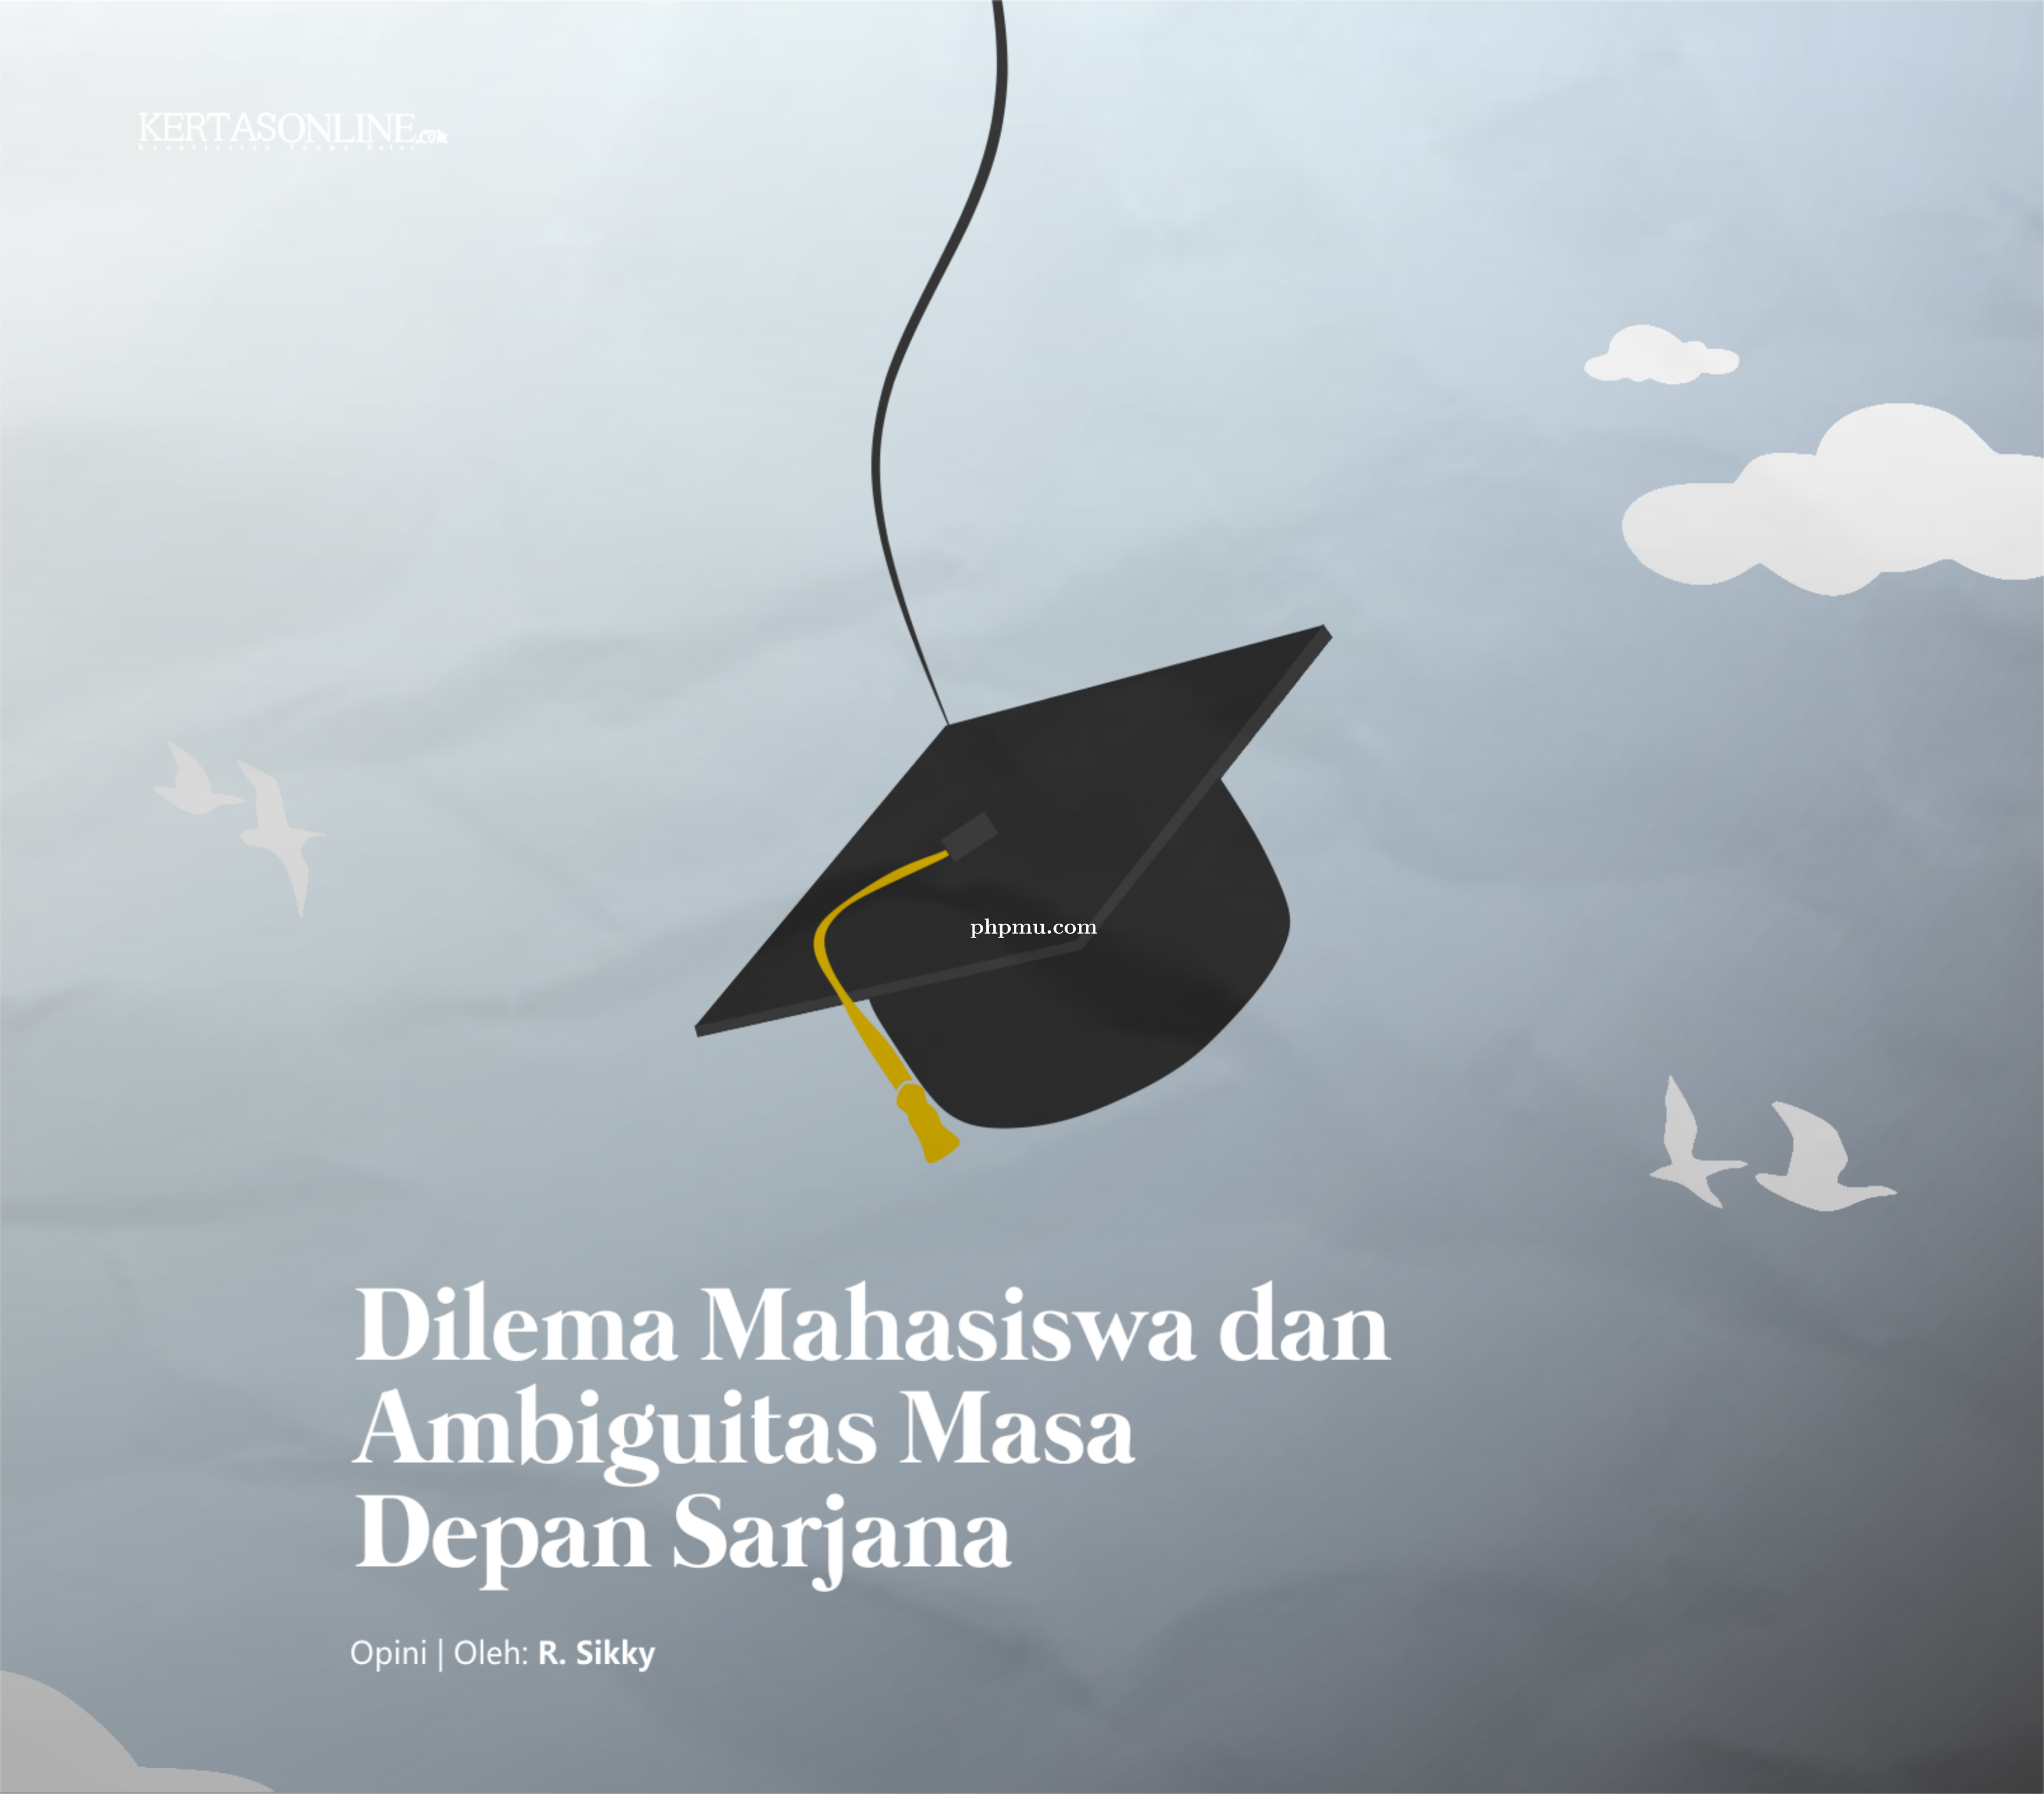 Dilema Mahasiswa dan Ambiguitas Masa Depan Sarjana